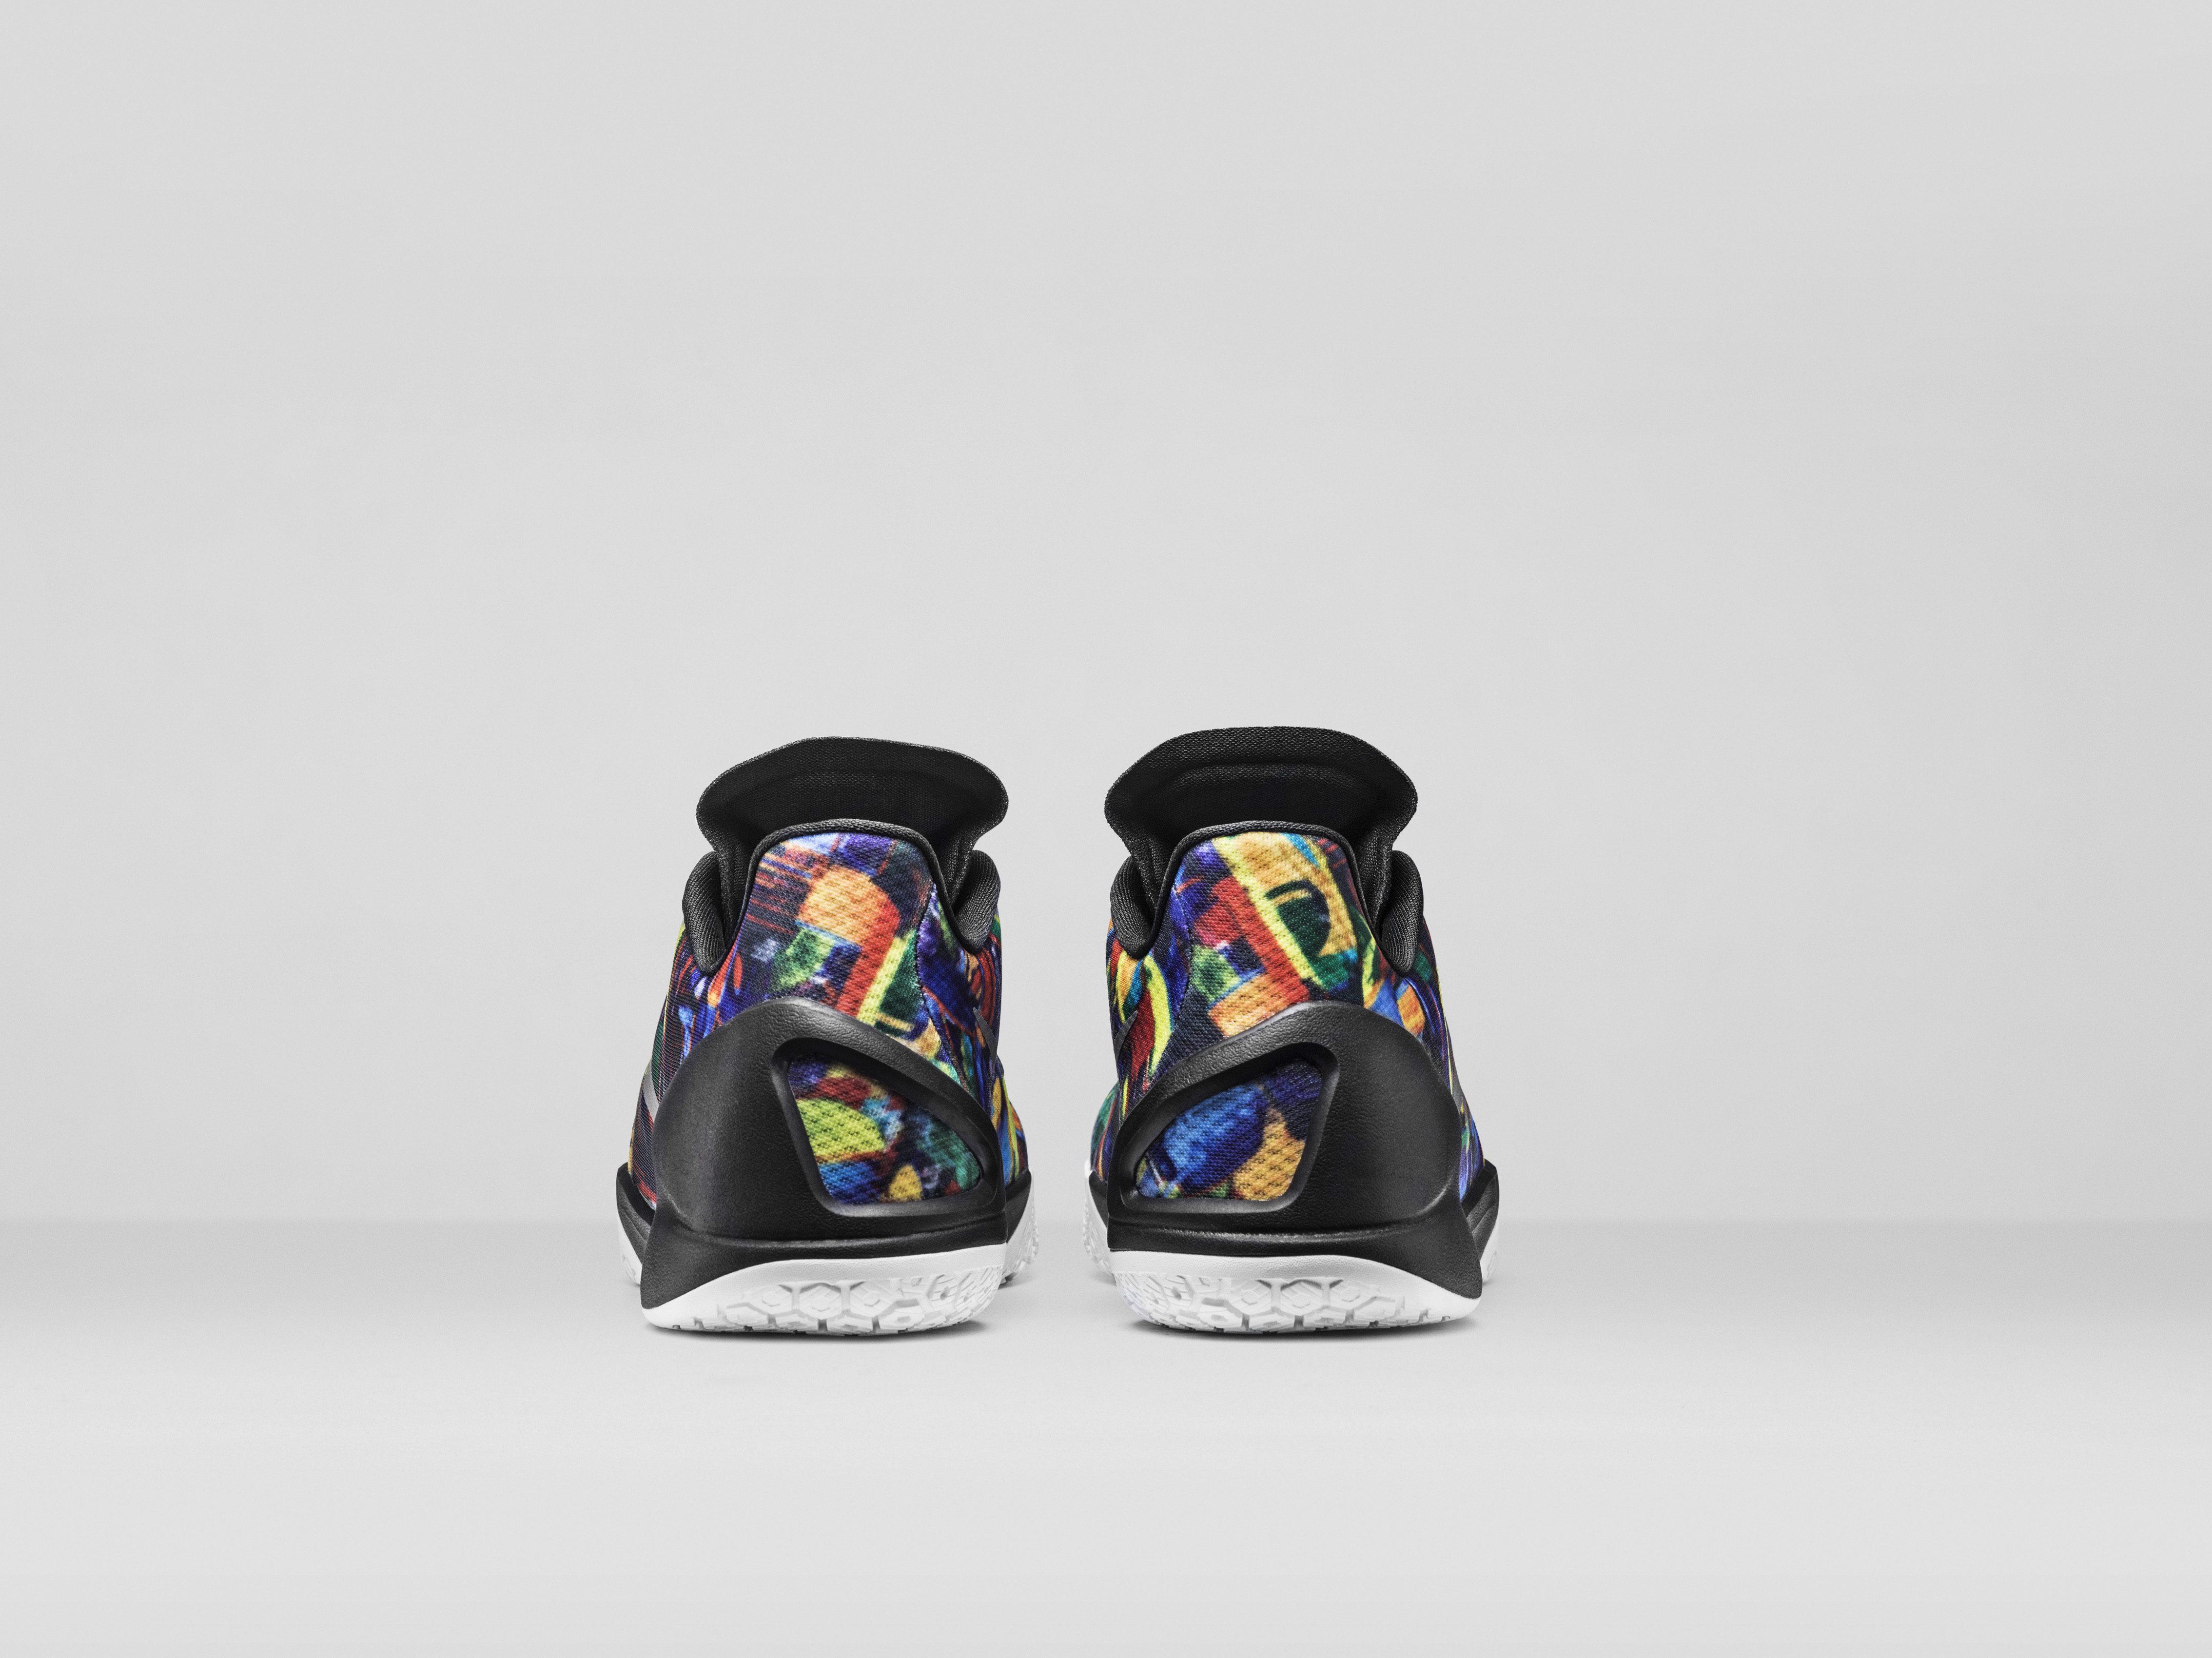 Nike_Net_Collectors_Society_HYPERCHASE_HEL_39413